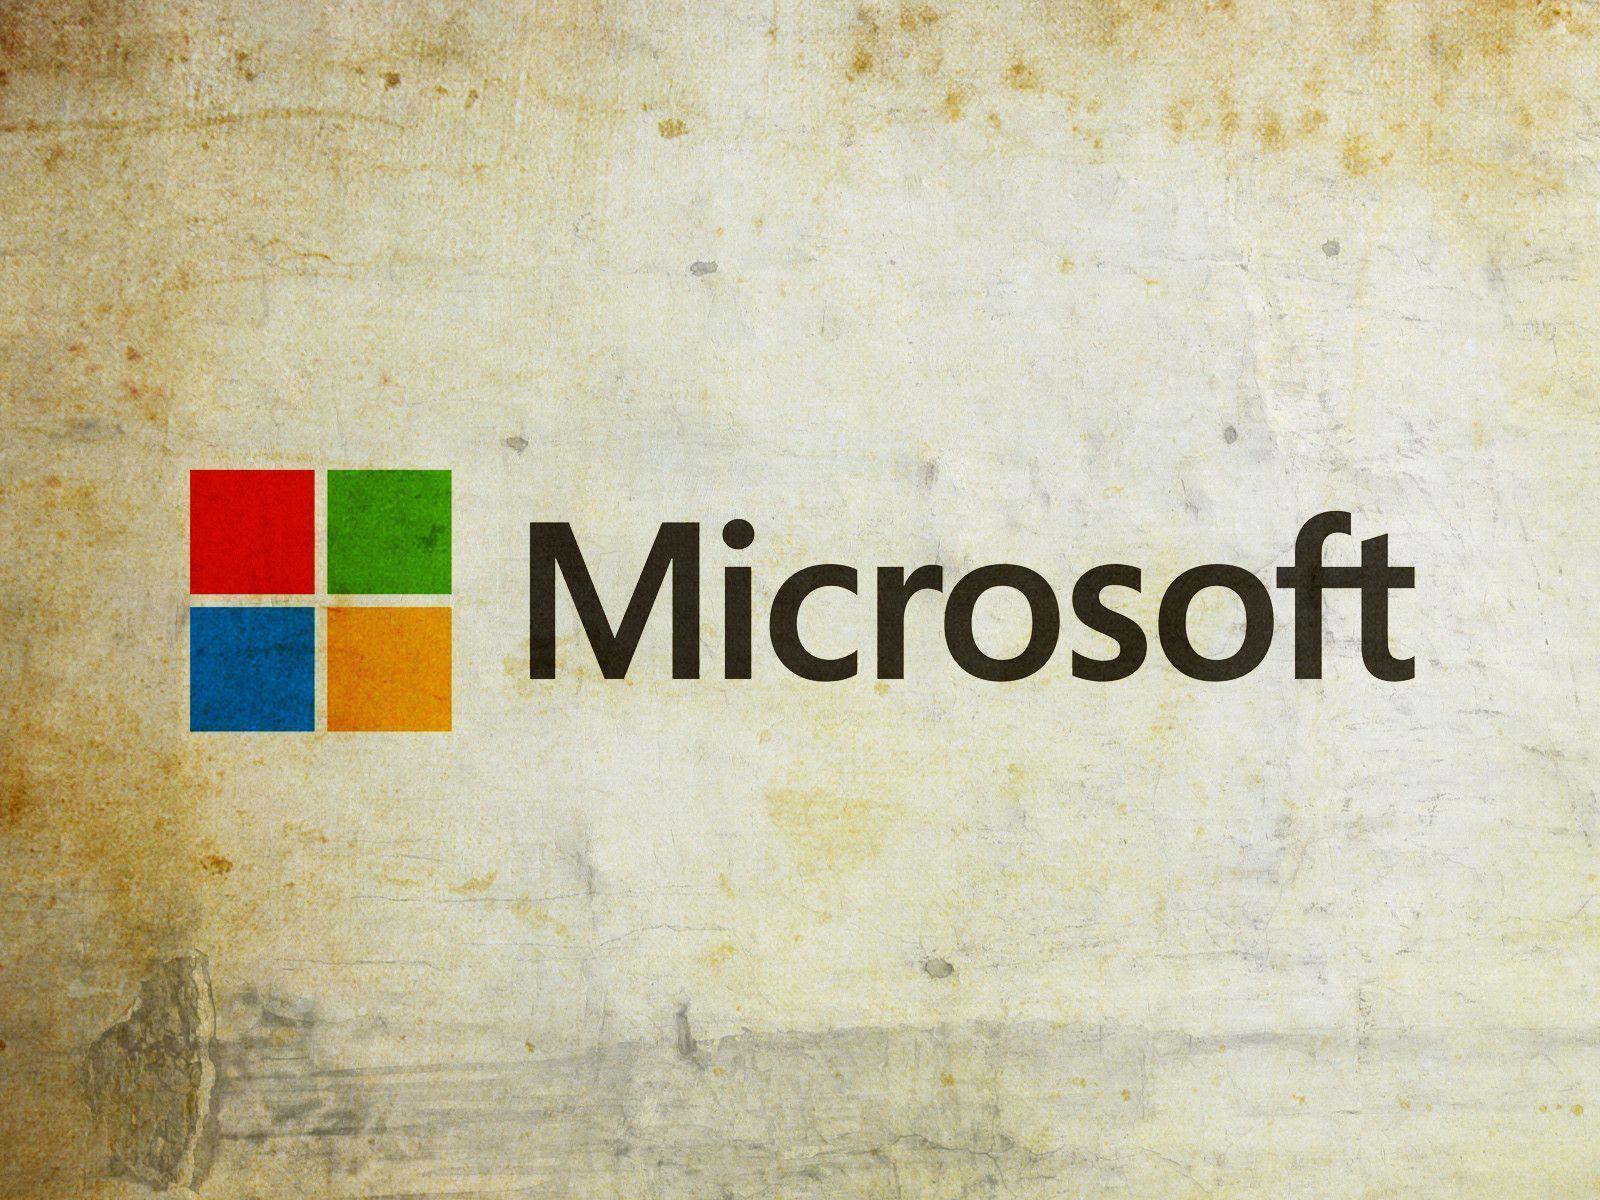 Microsoft Wallpapers Free  Wallpaper Cave